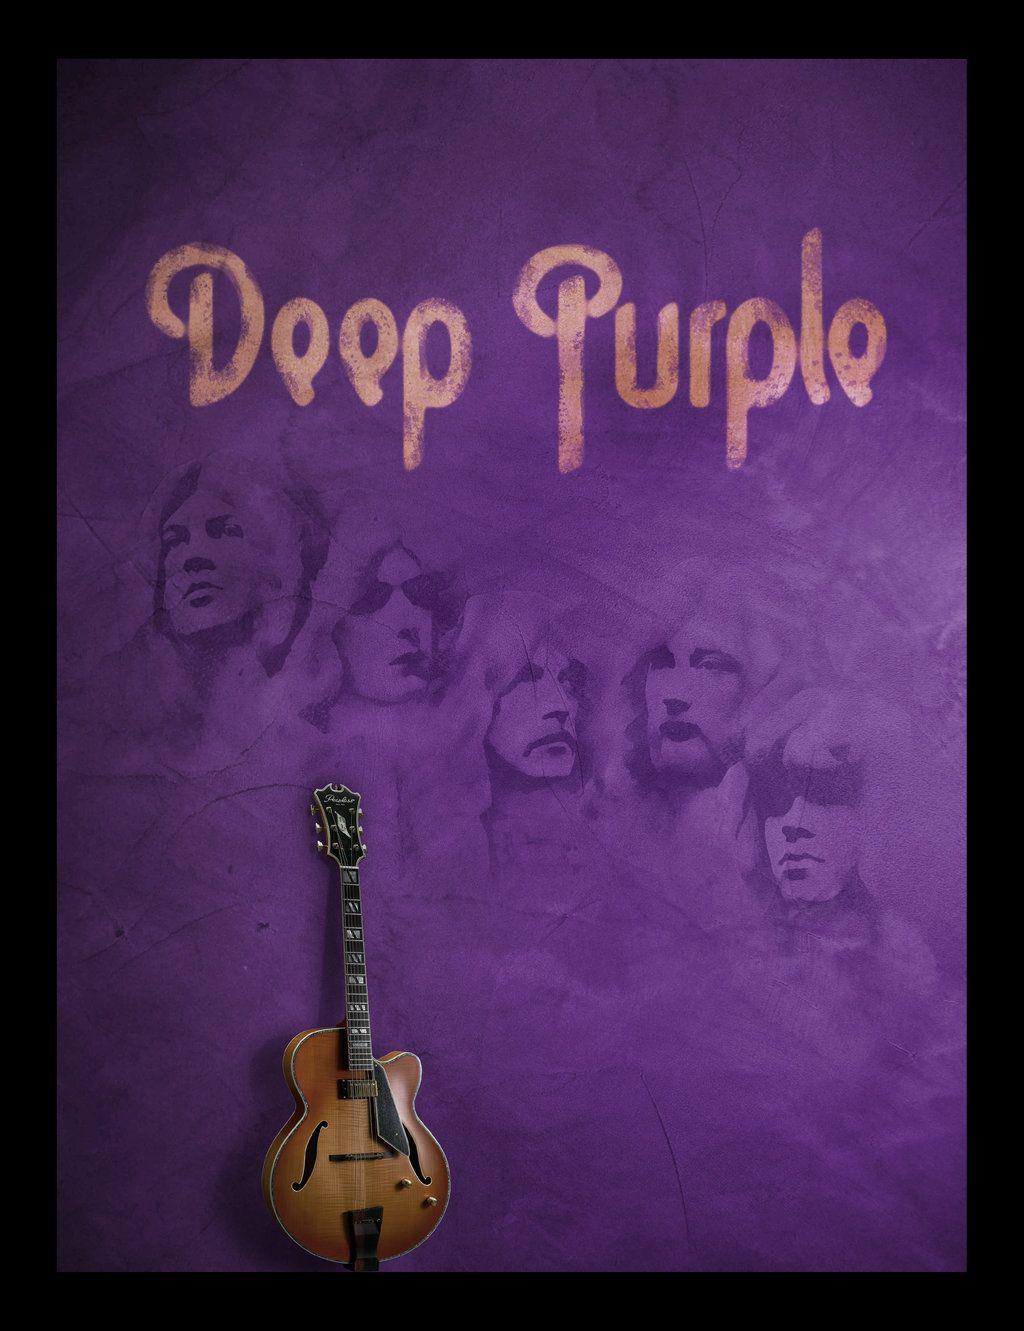 Deep Purple Poster By Searchingmyafflatus On Deviantart Rock Album Covers Deep Purple Rock Posters